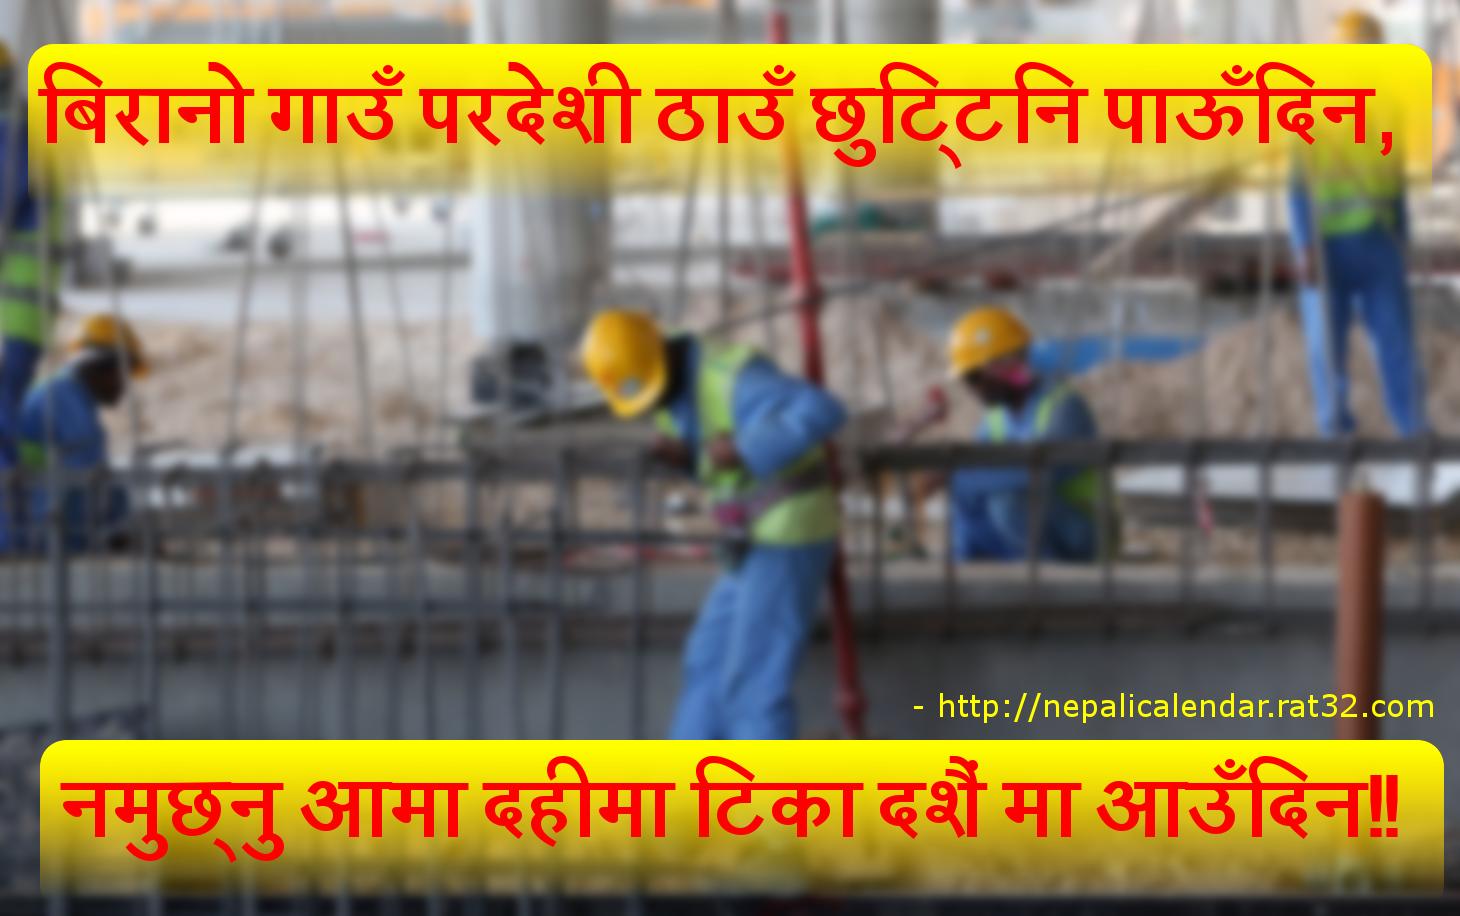 Happy Dashain 2071 biranu thau pardesi gaun chuttini paudina, namuchnu ...